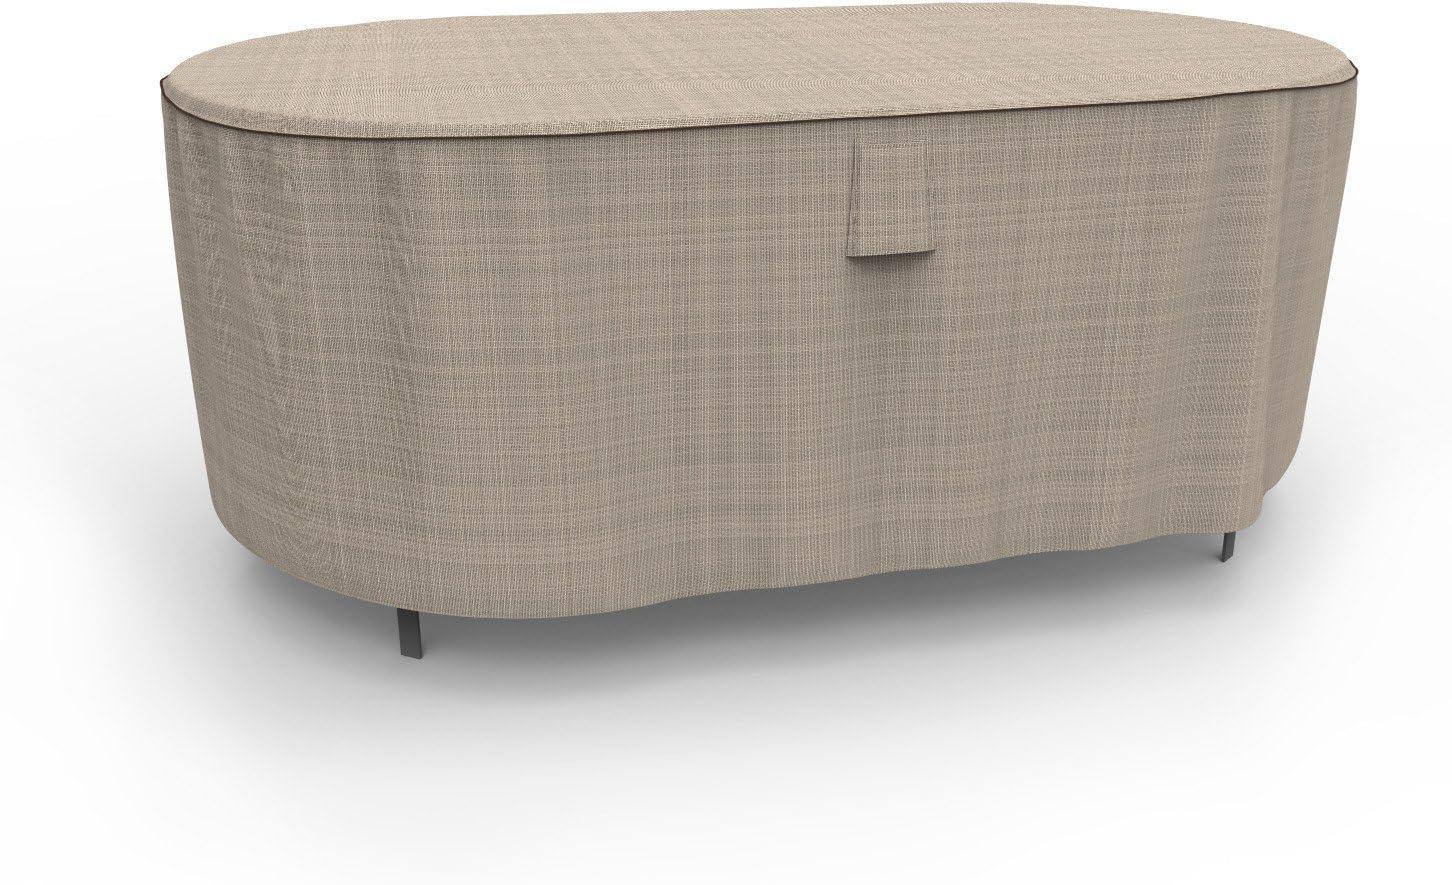 Budge P5A20PM1 English Garden Oval Patio Table Cover, Medium, Two-Tone Tan